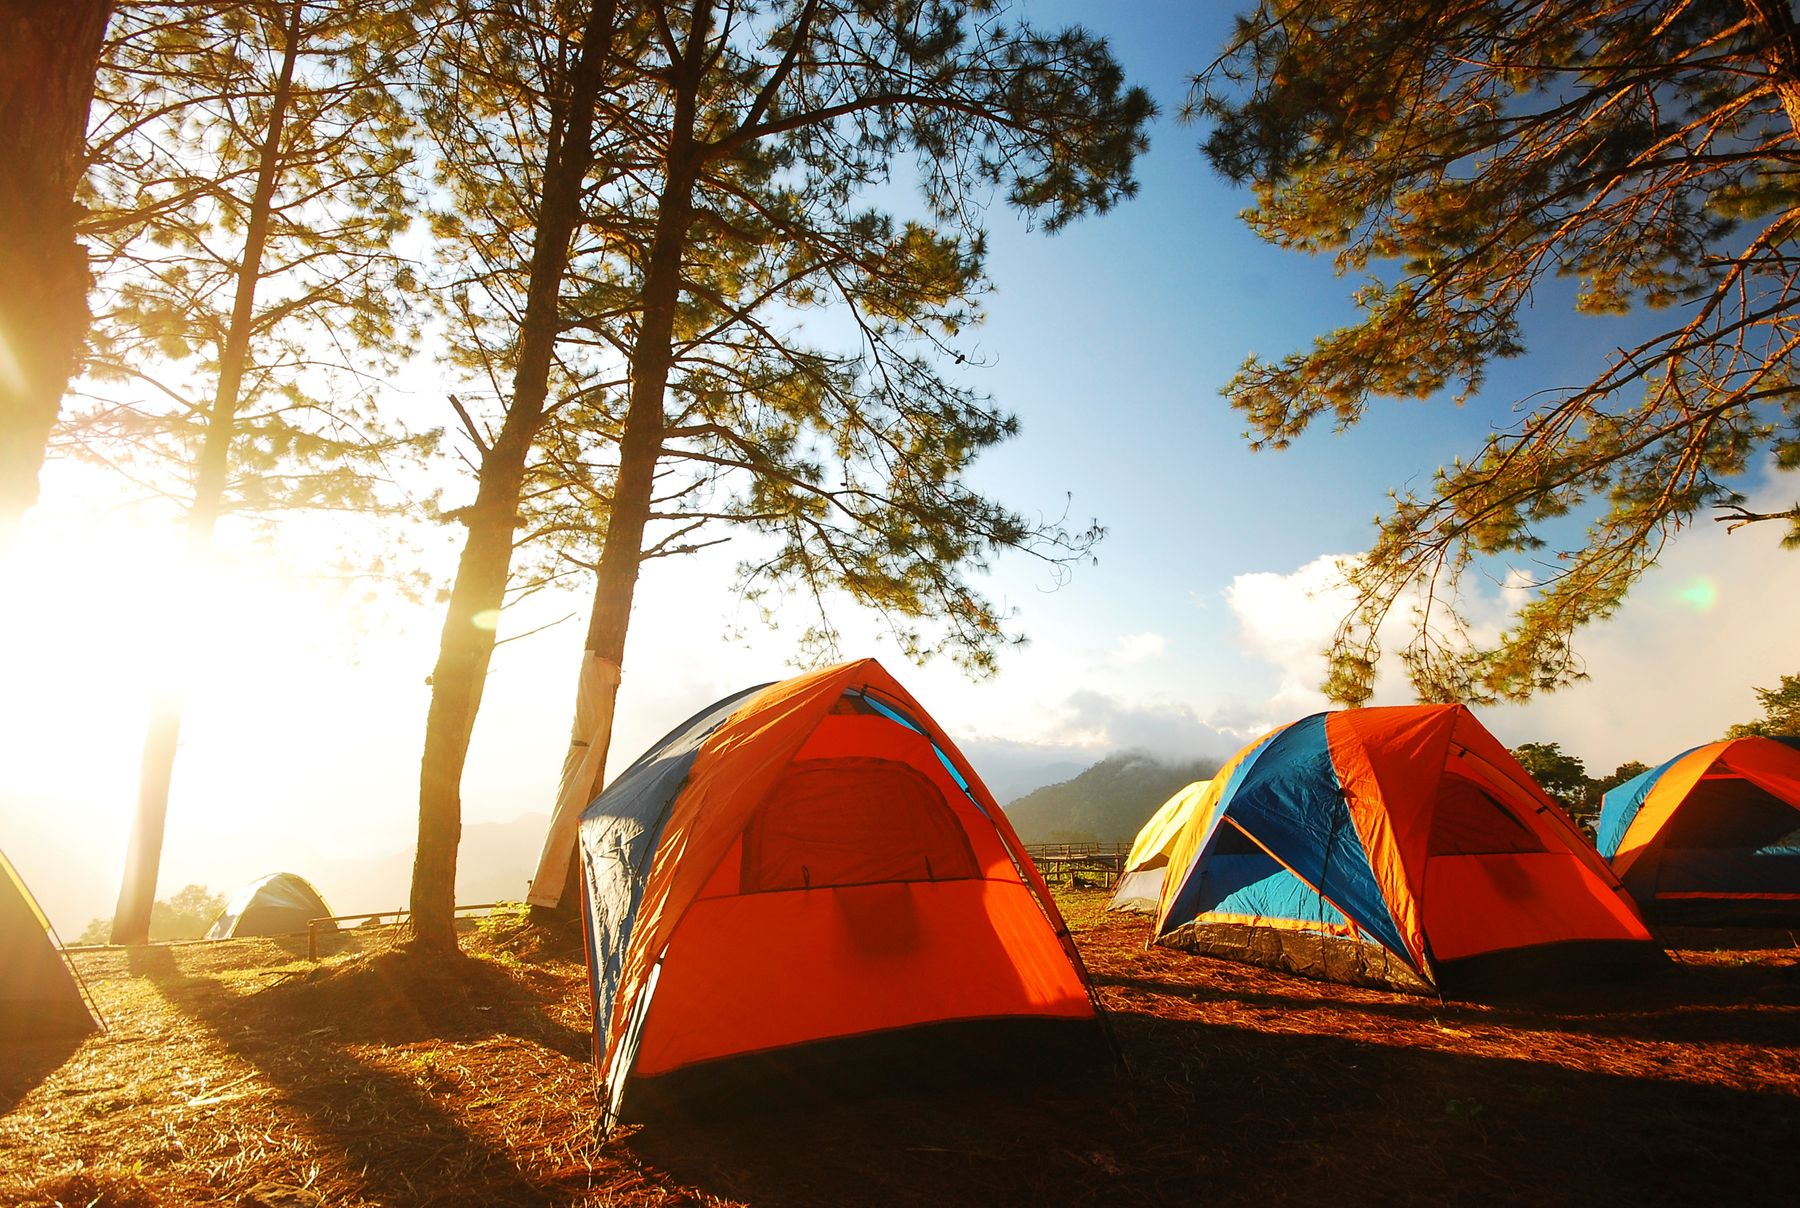 Row of colourful tents facing a sunrise